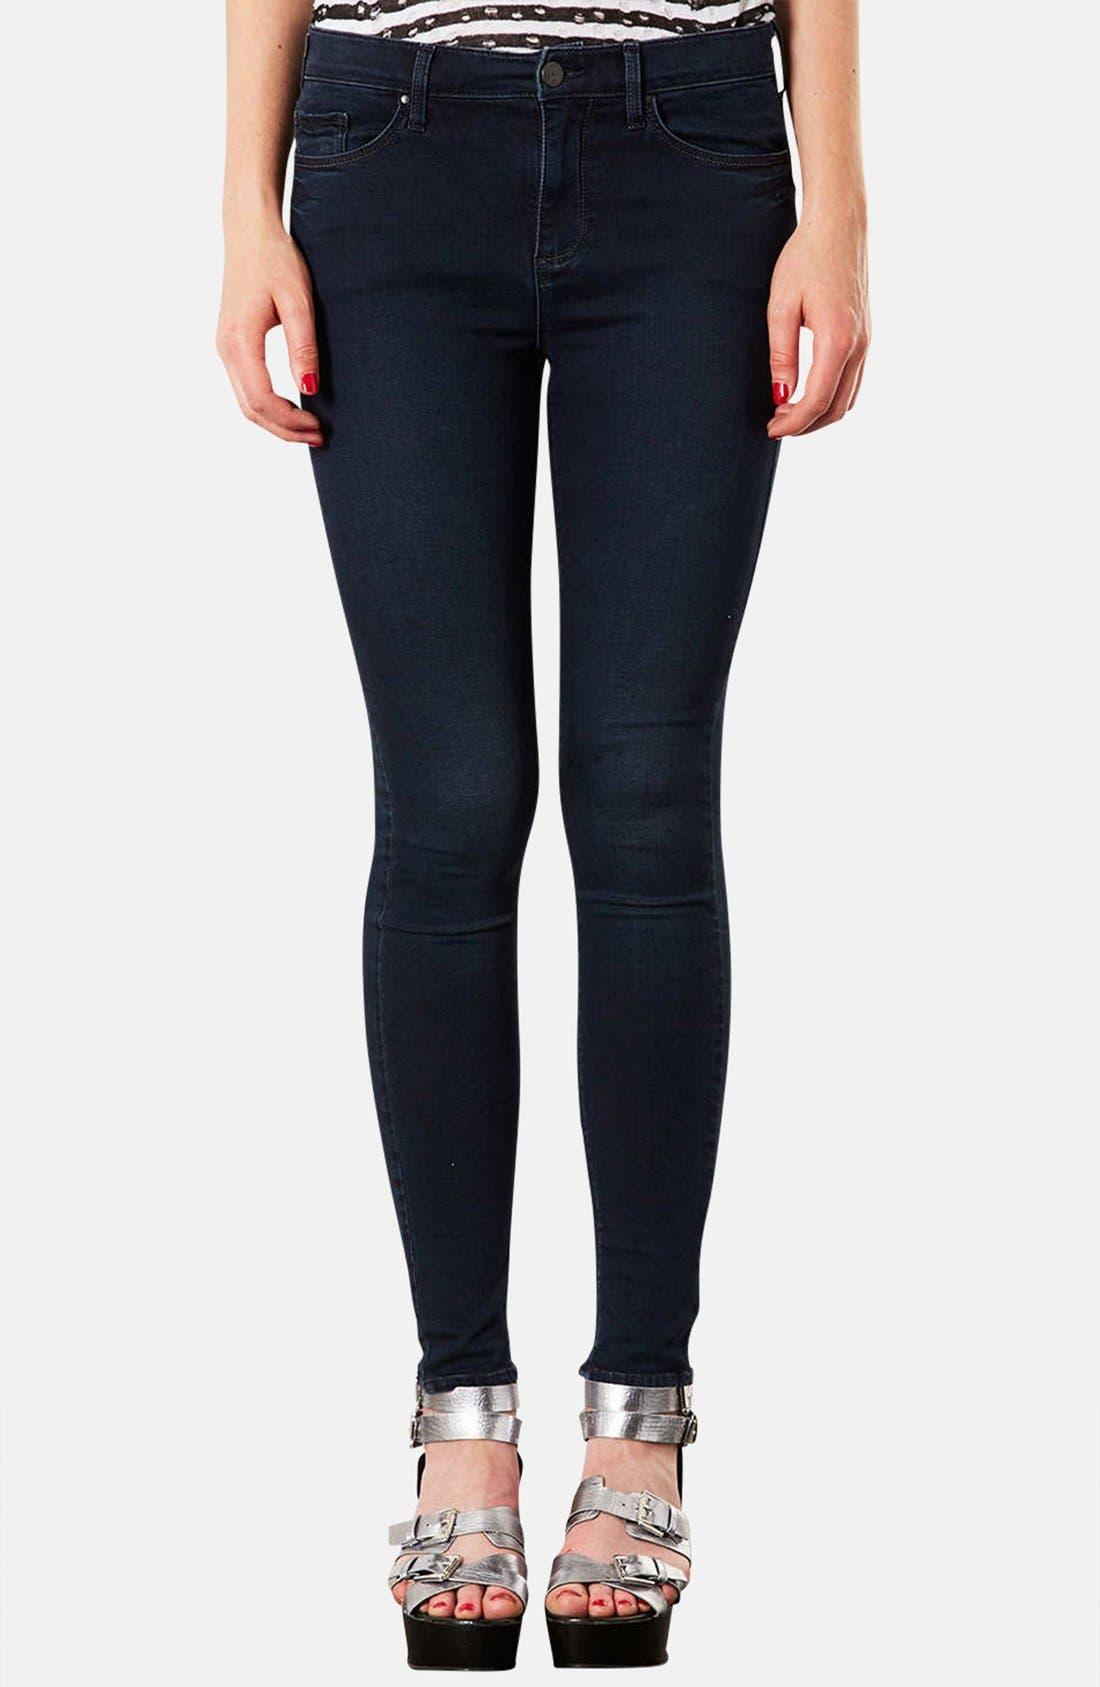 Alternate Image 1 Selected - Topshop Moto 'Leigh' Skinny Jeans (Indigo) (Regular & Short)